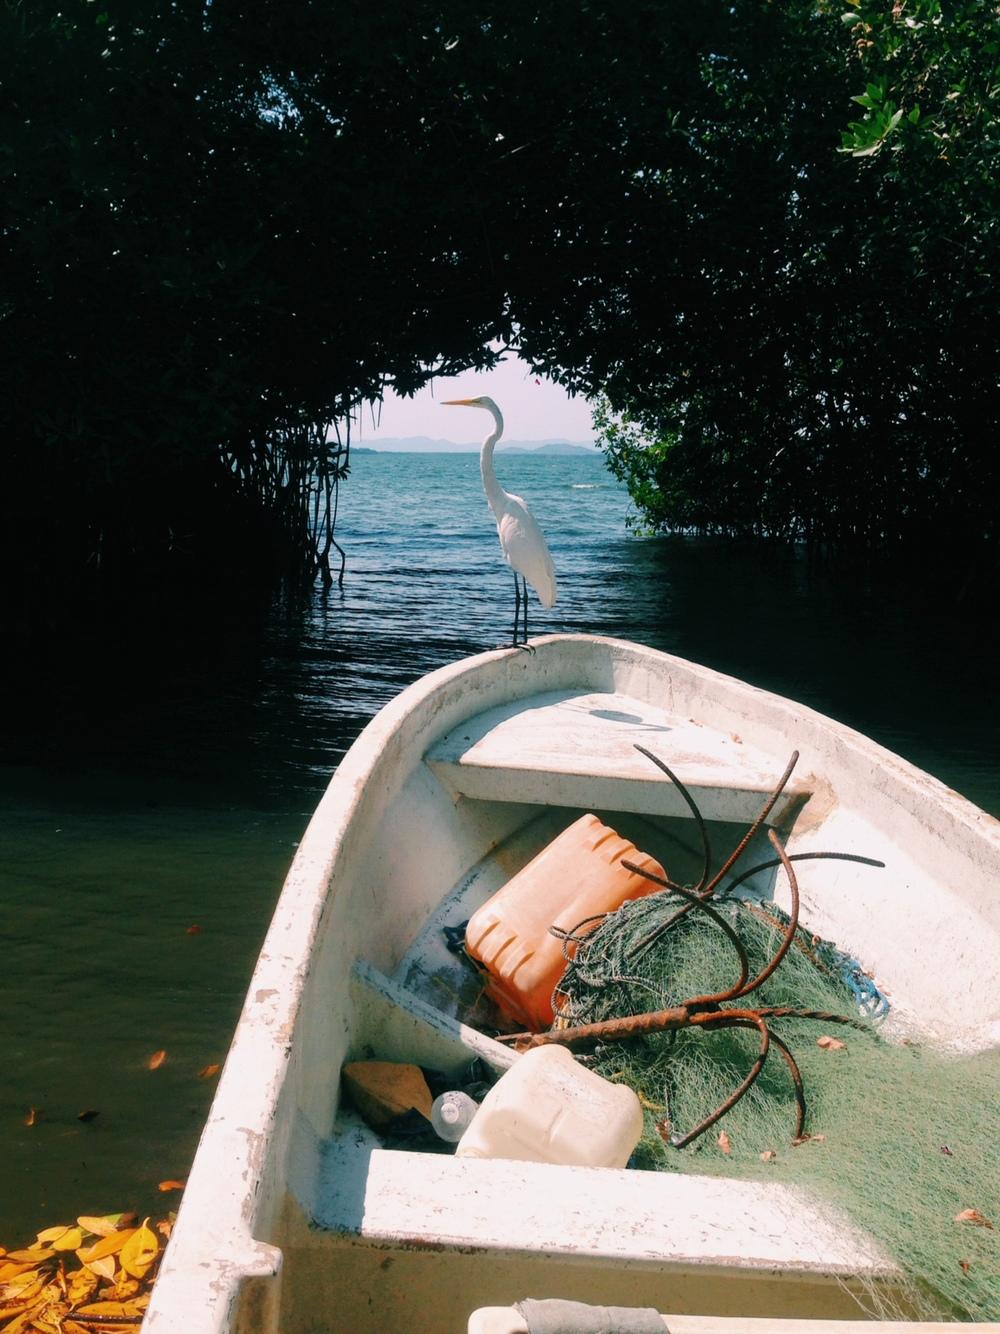 mexico bird on boat.JPG